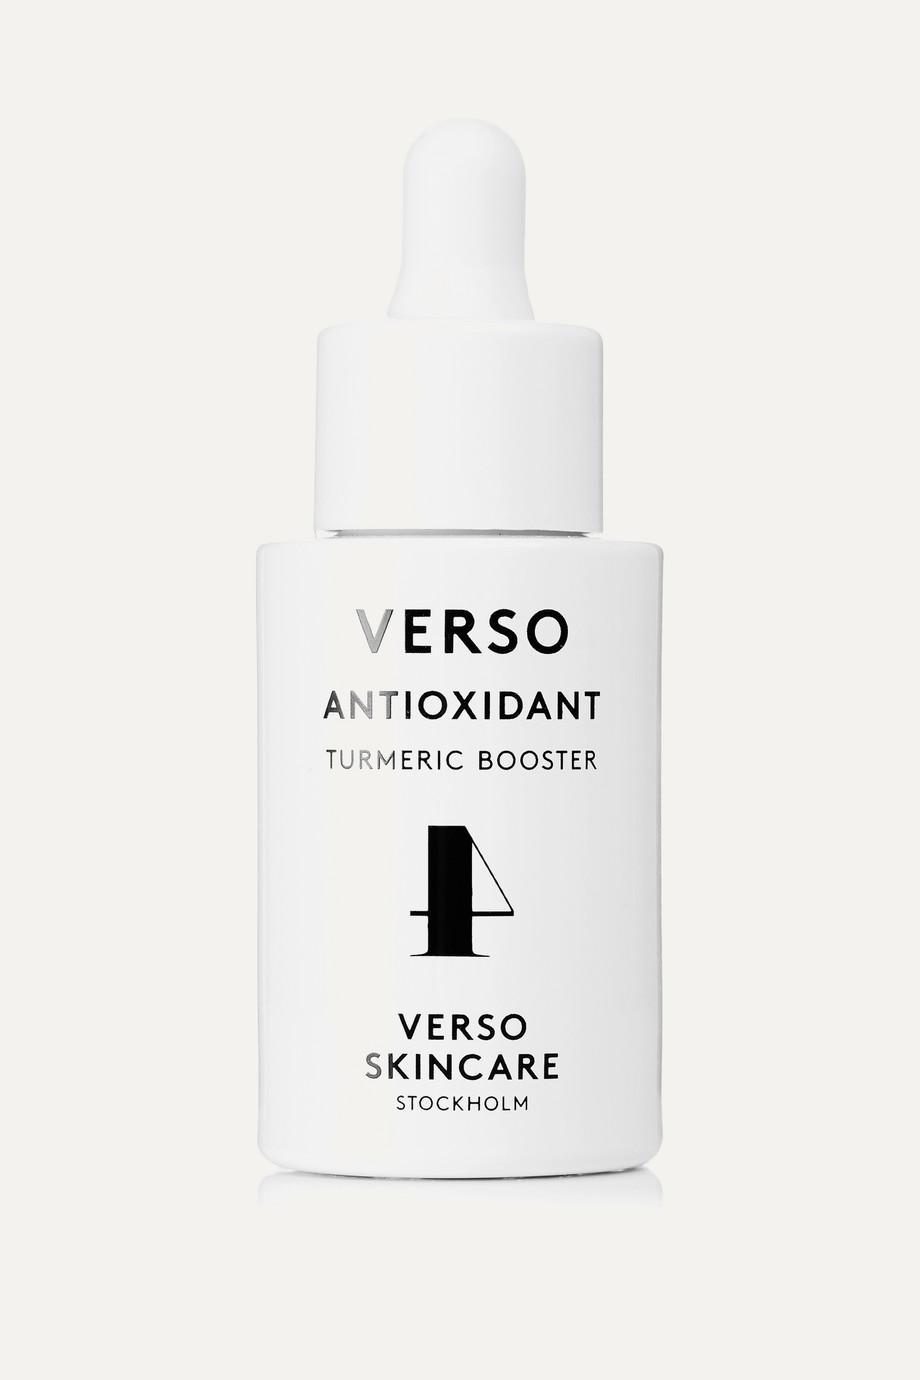 Verso Antioxidant Turmeric Booster, 30 ml – Serum